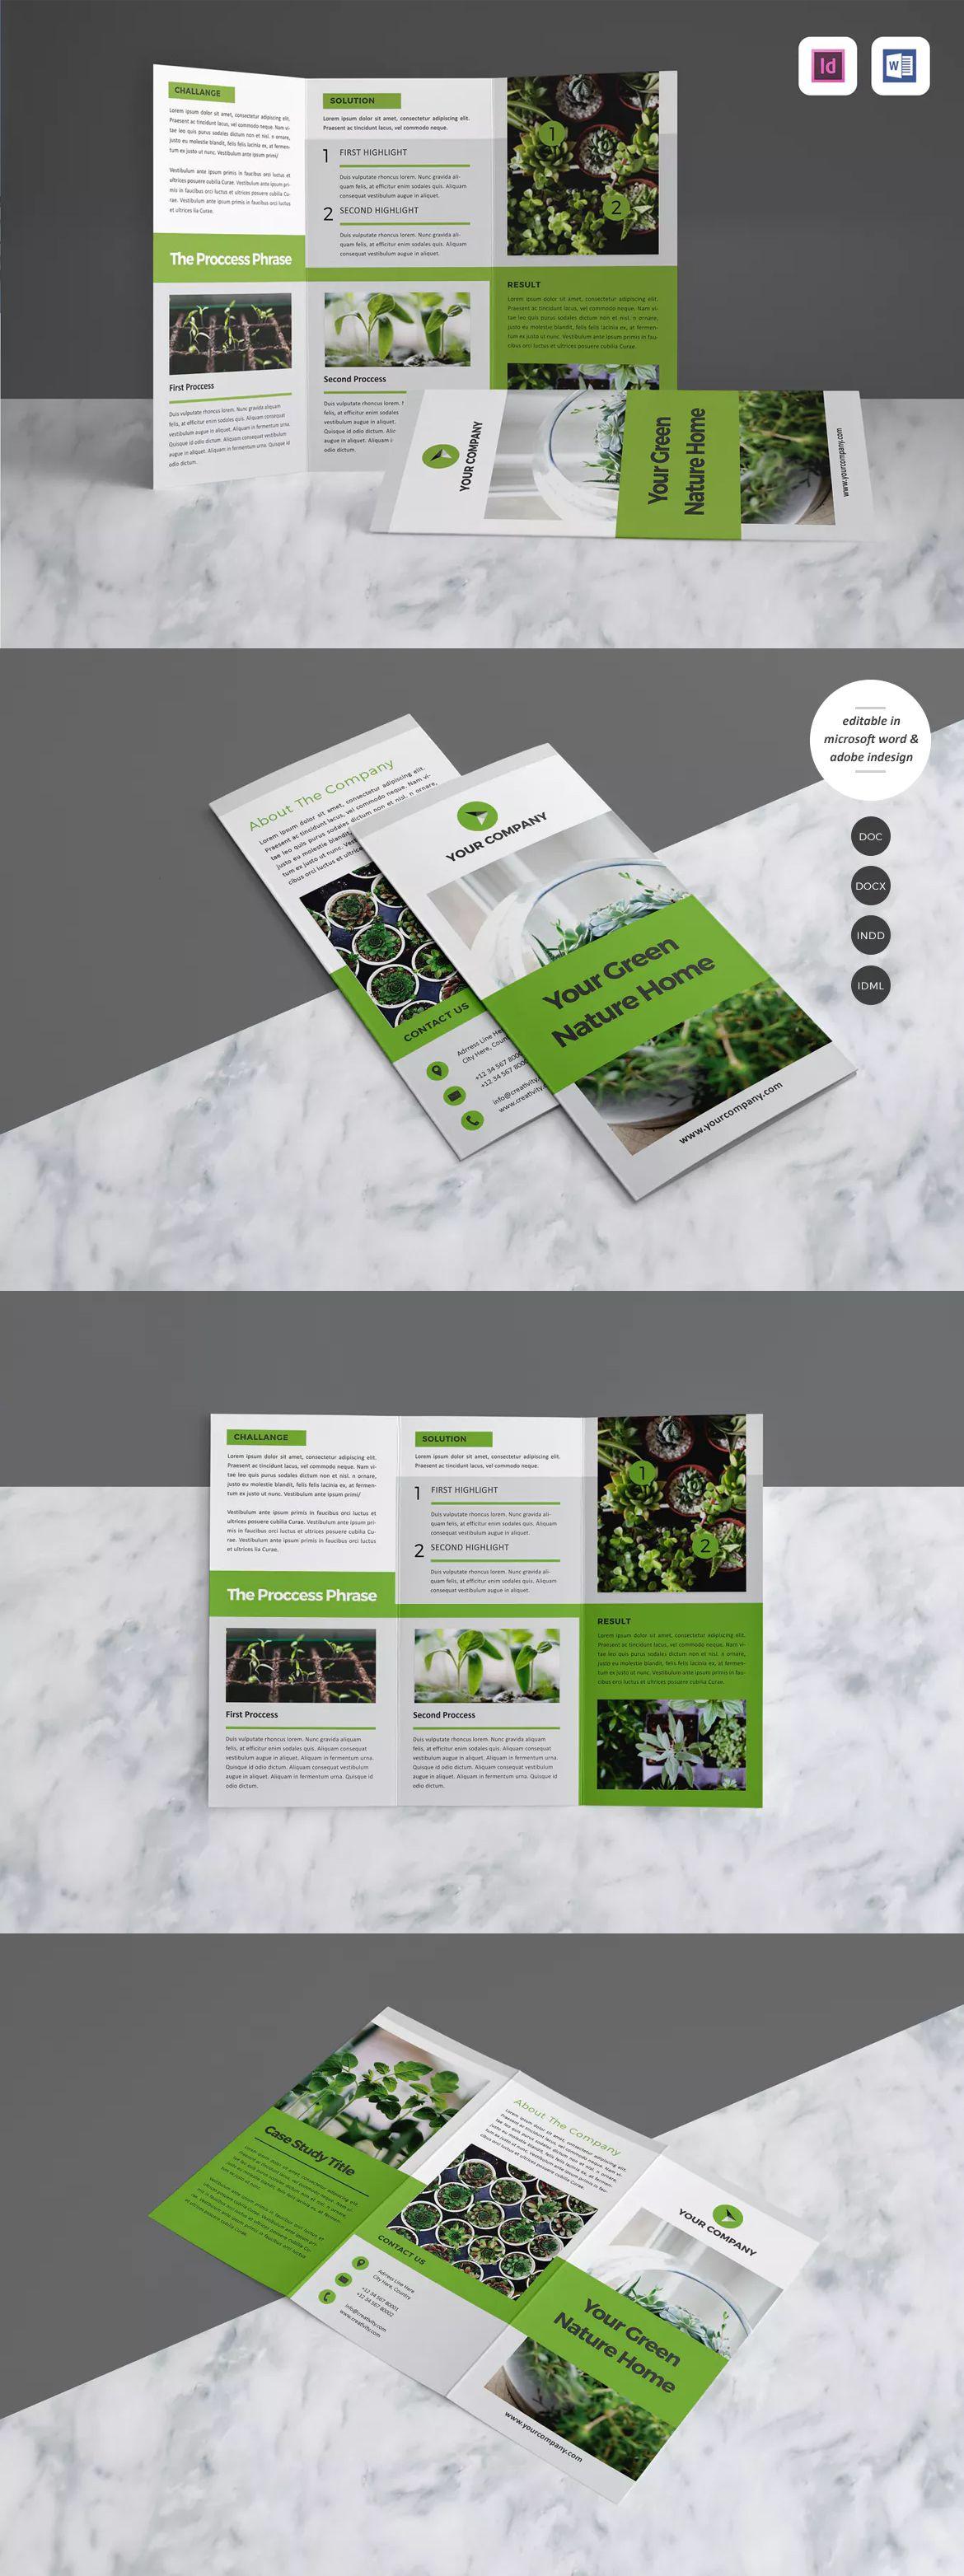 Case Study Brochure Template Indesign Indd A4 Brochure Design